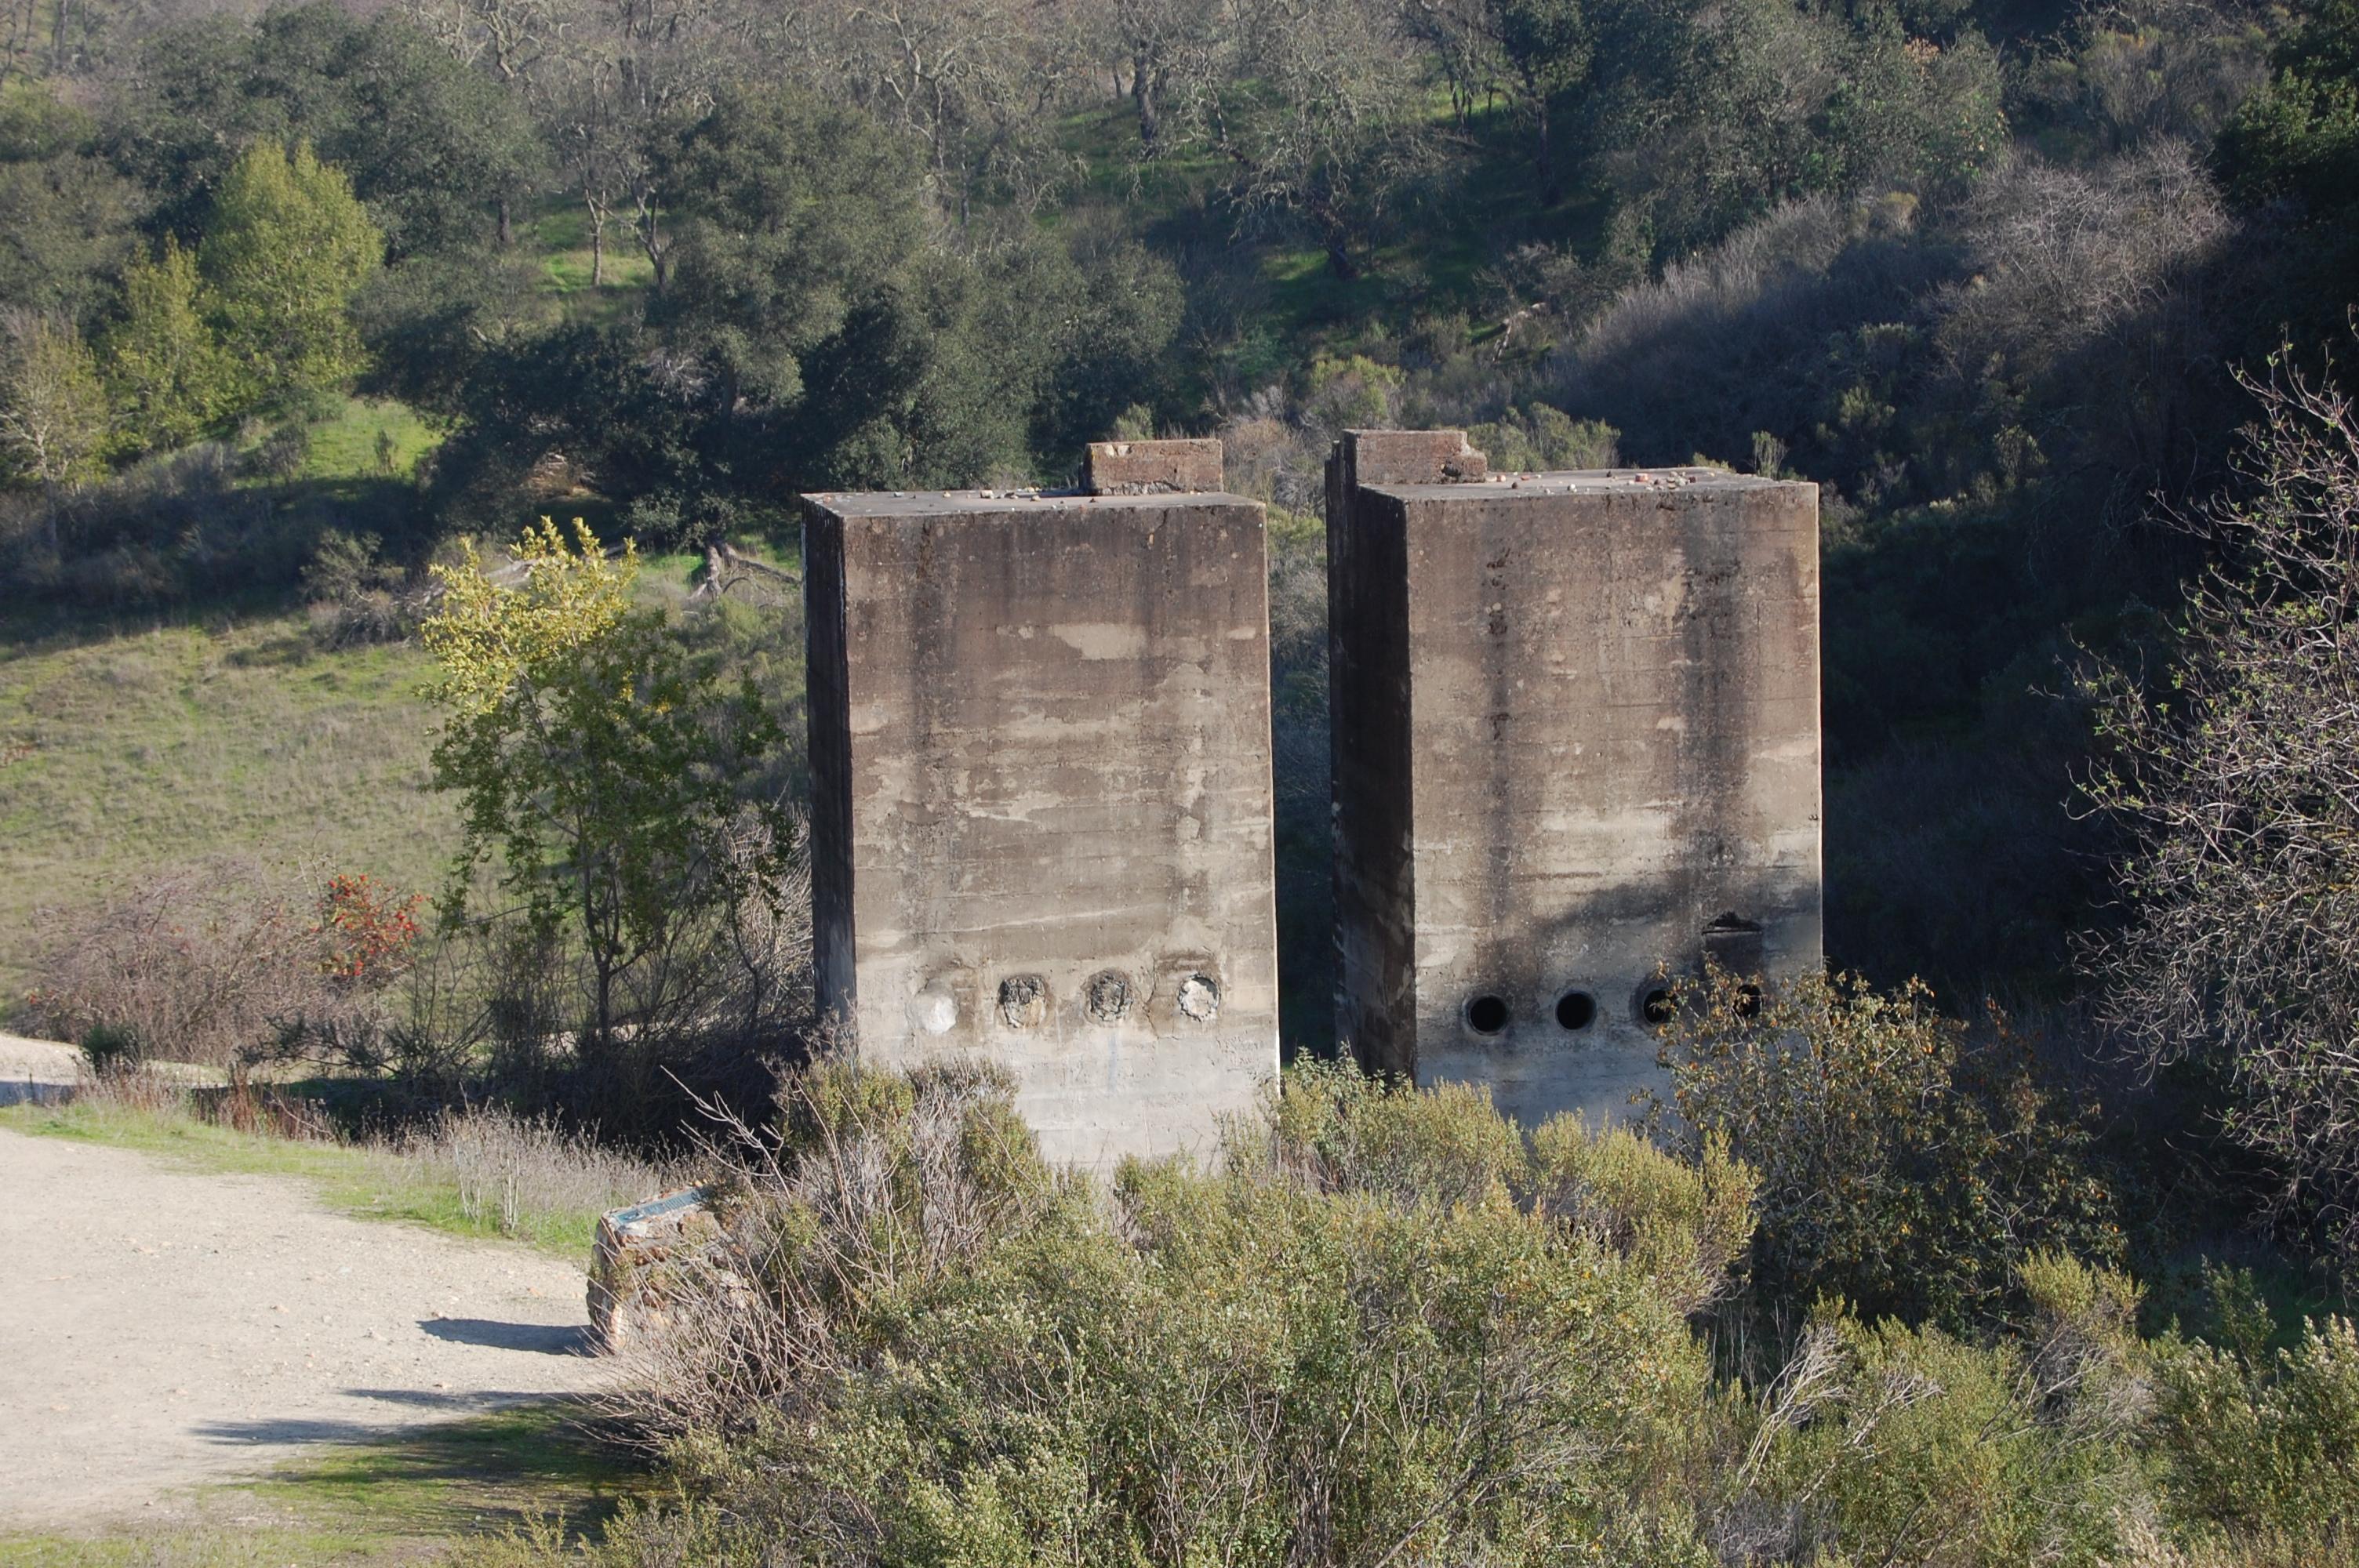 USA-San Jose-Almaden Quicksilver Park-El Senador Mine-4.jpg